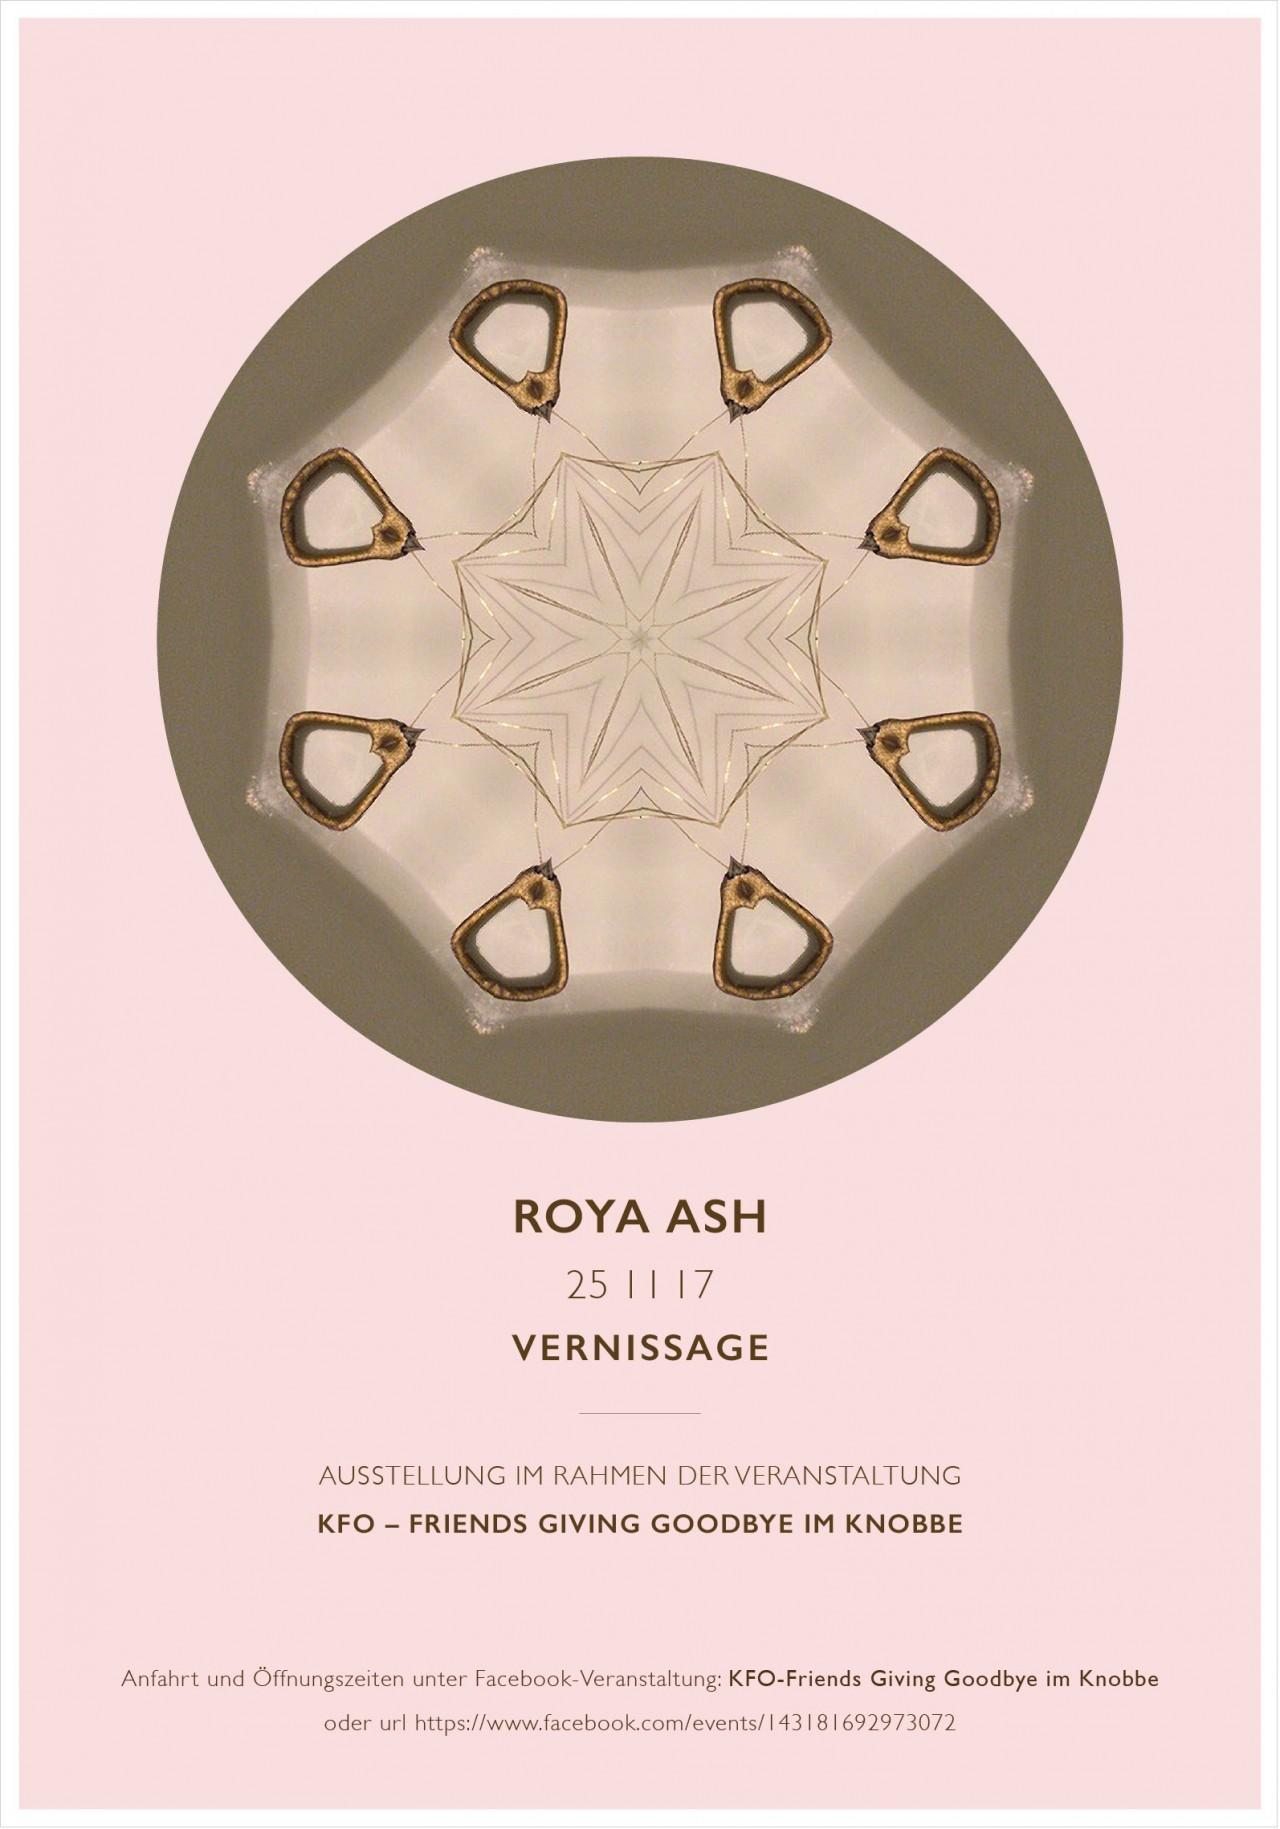 roya ash hier